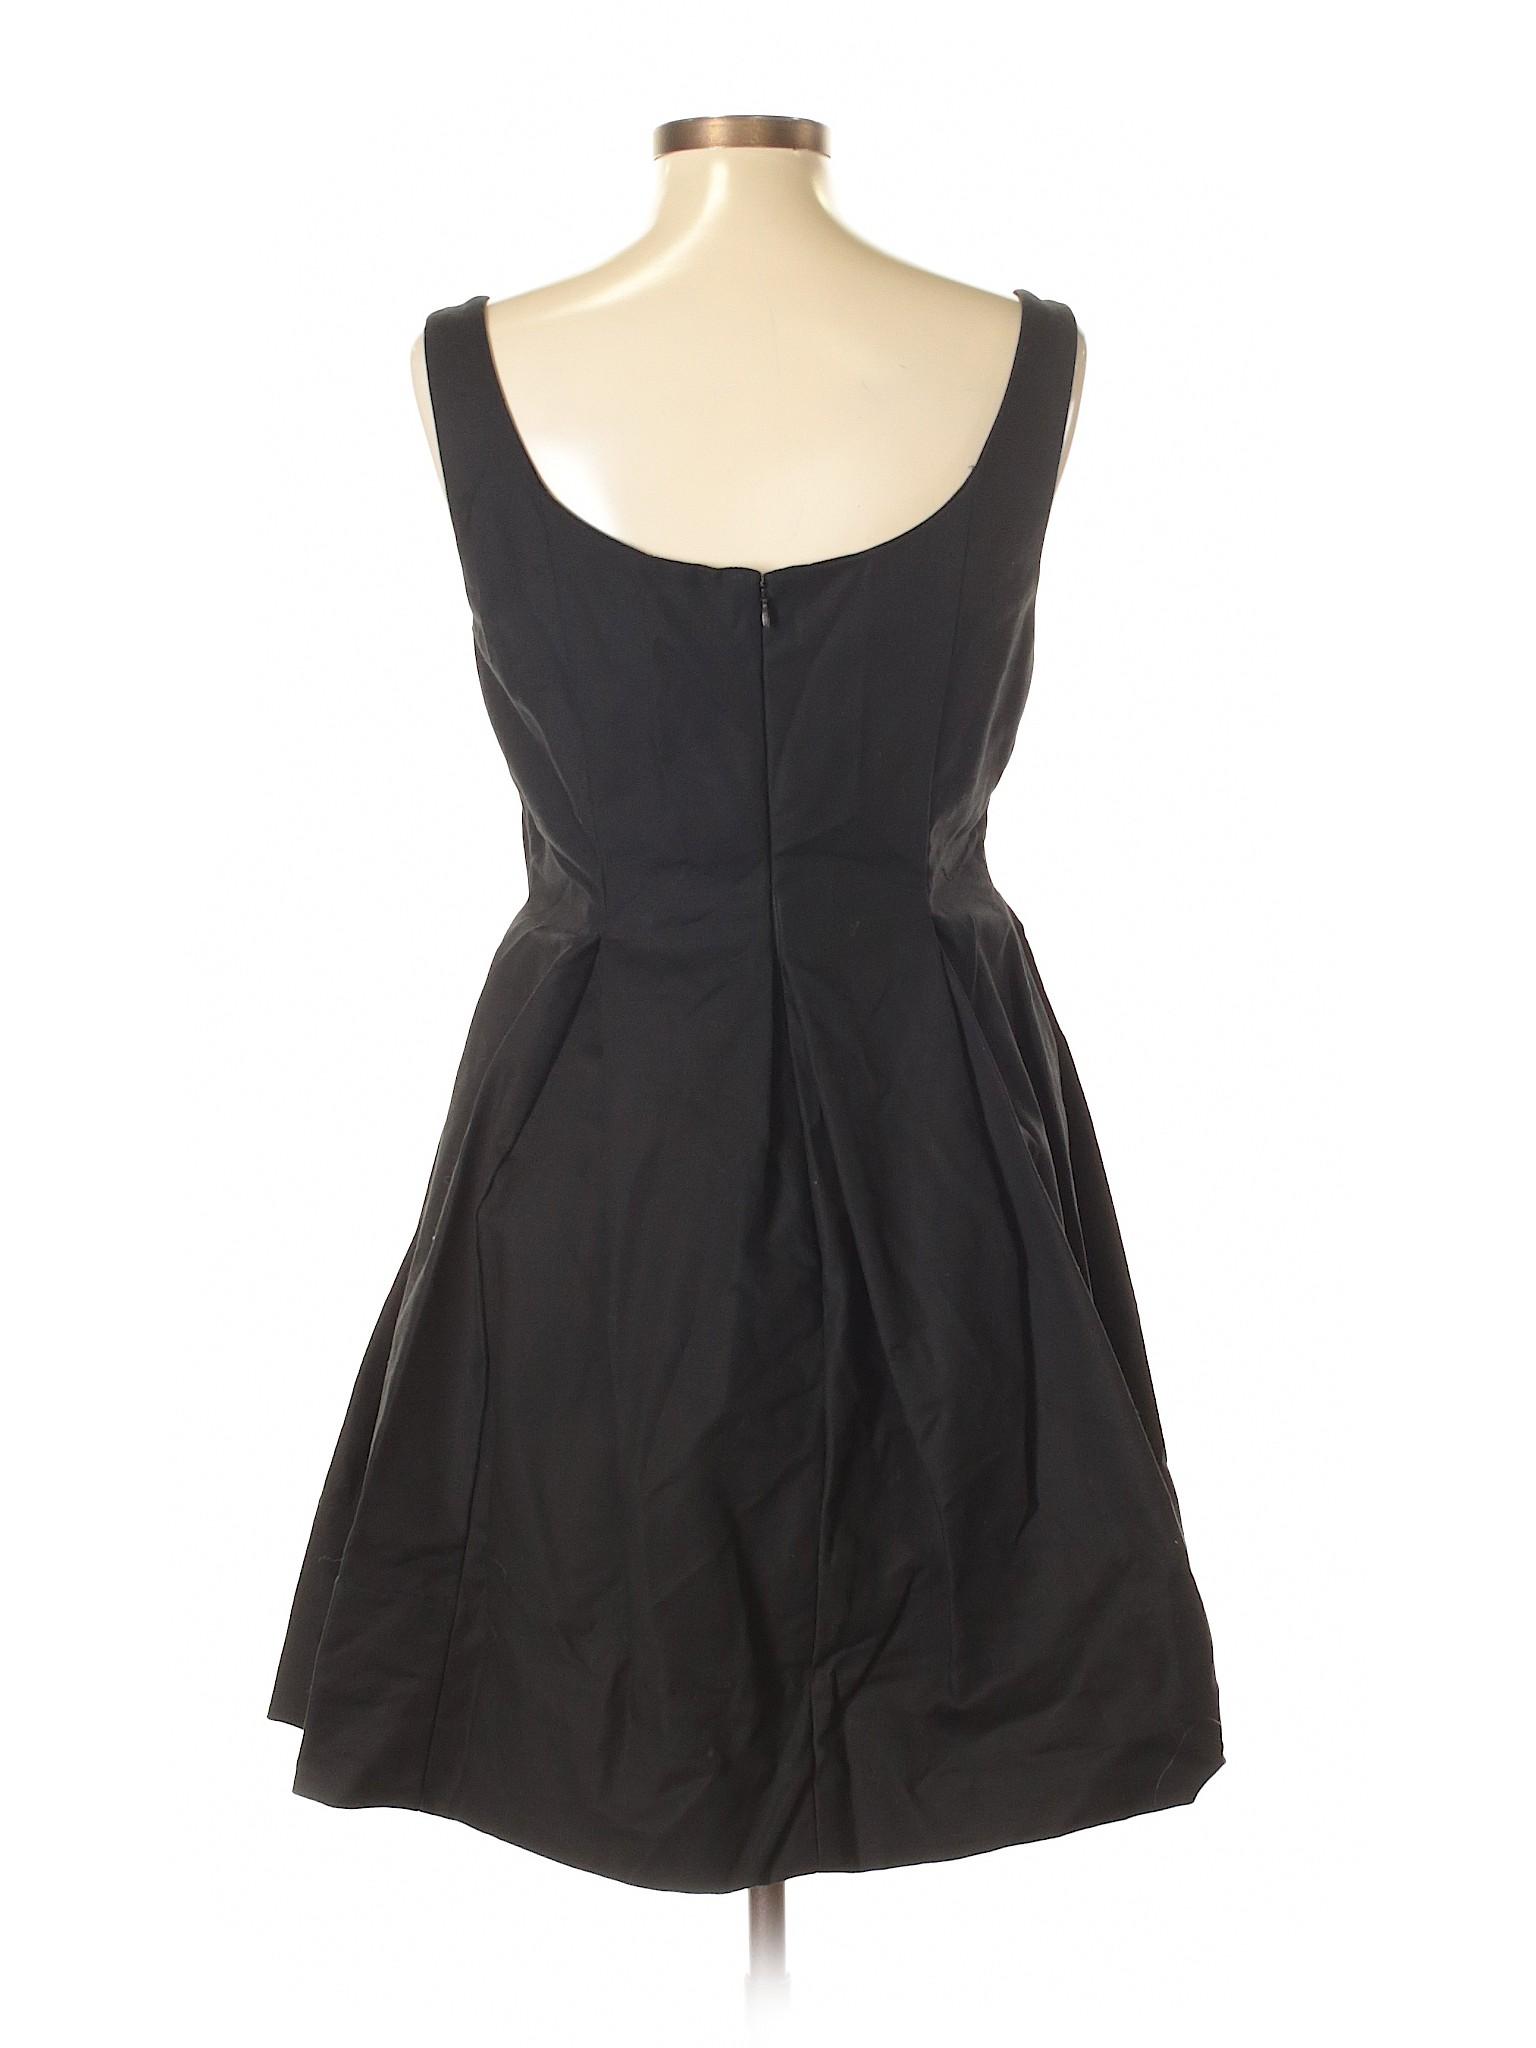 Casual Dress Selling Selling Gap Casual Gap Dress wavqOHBXX